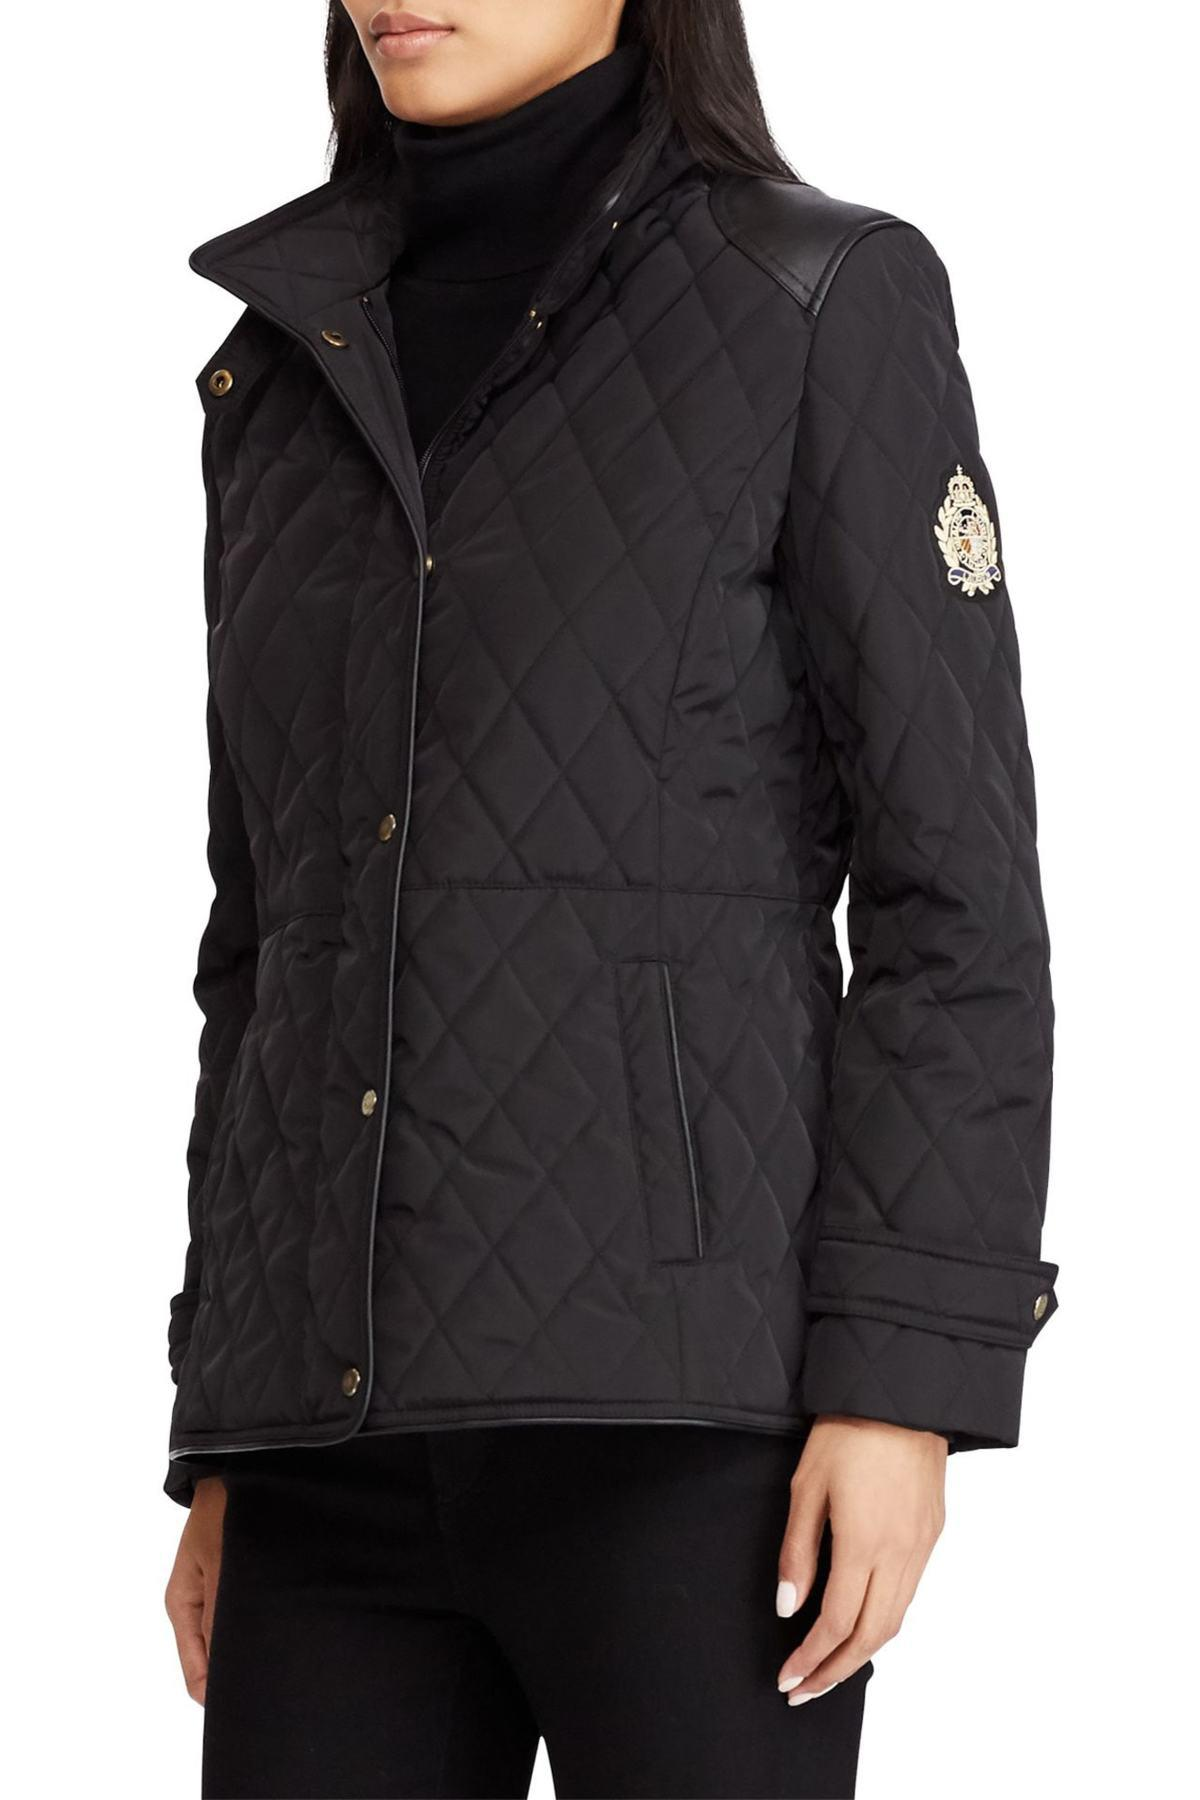 Lauren by Ralph Lauren Quilted Faux Leather Trim Jacket ...